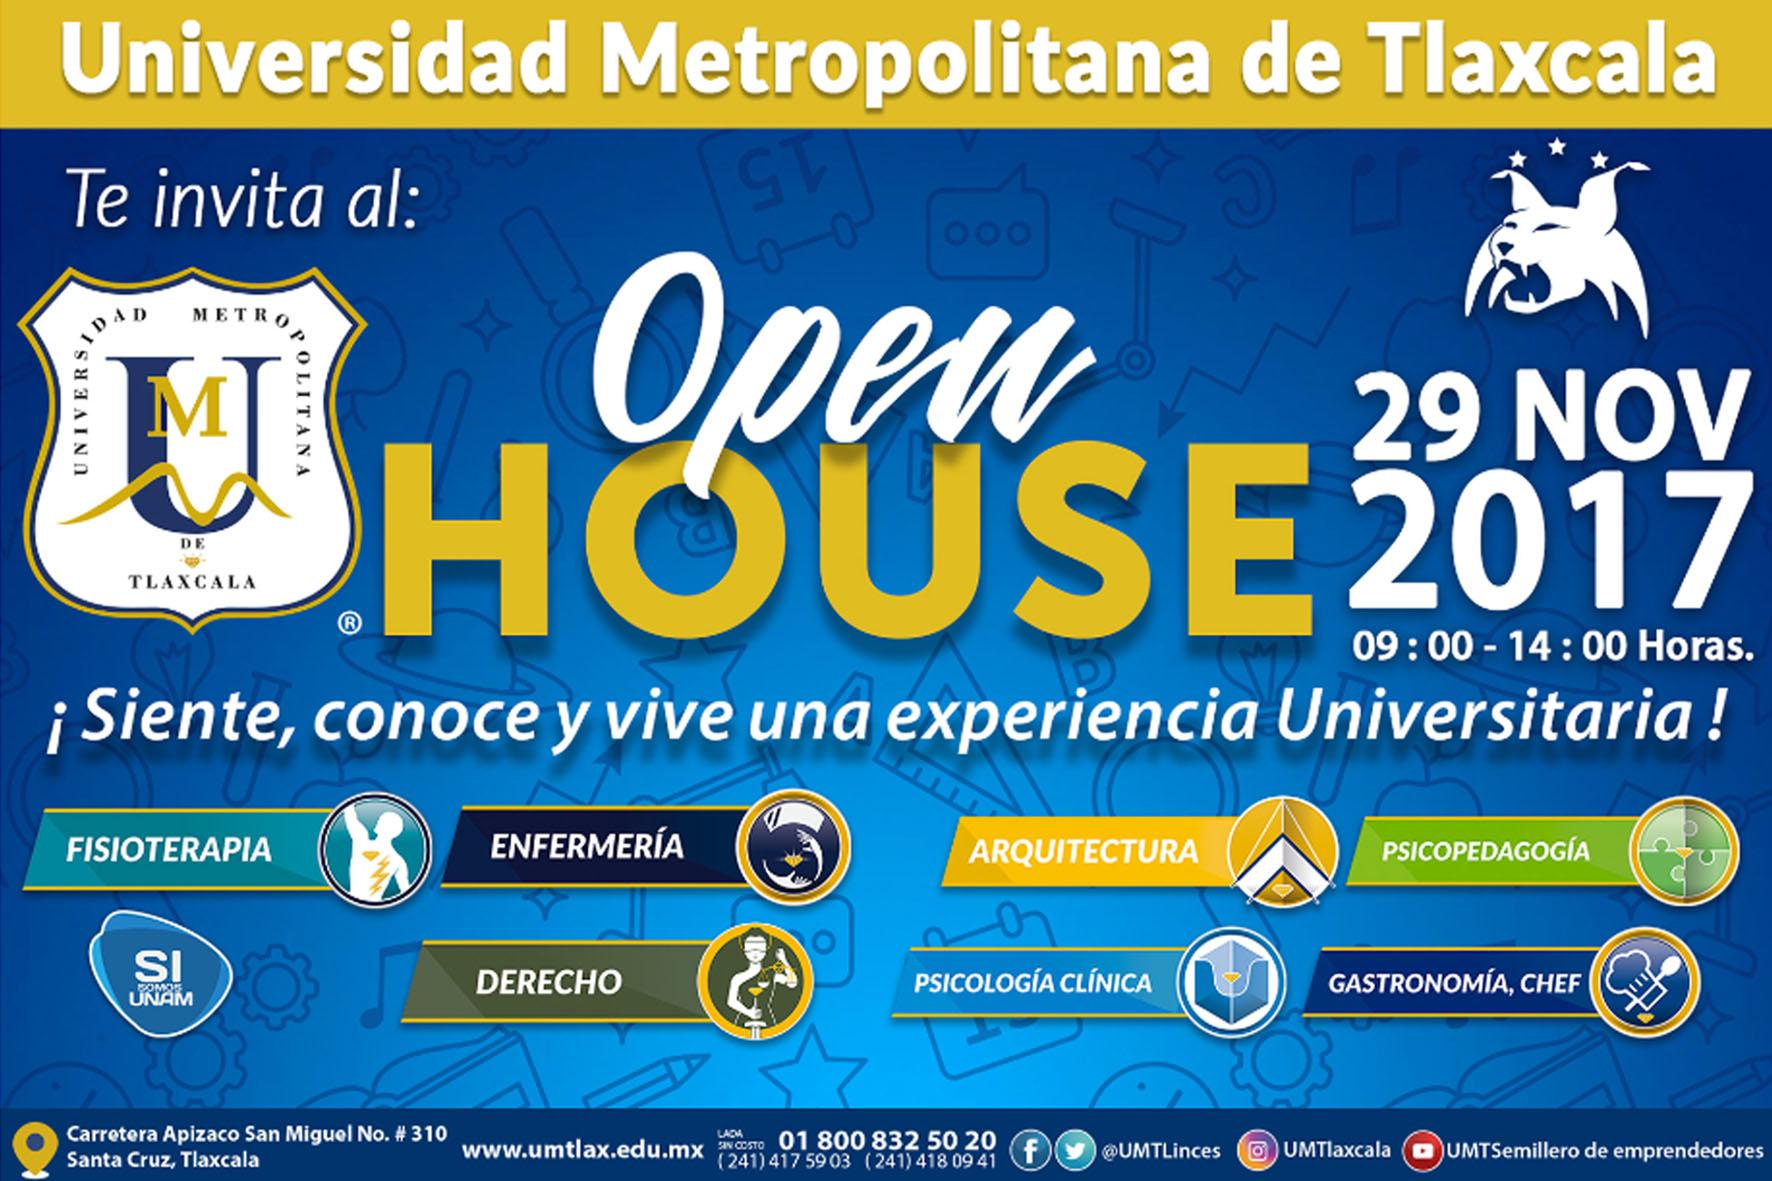 Universidad Metropolitana de Tlaxcala